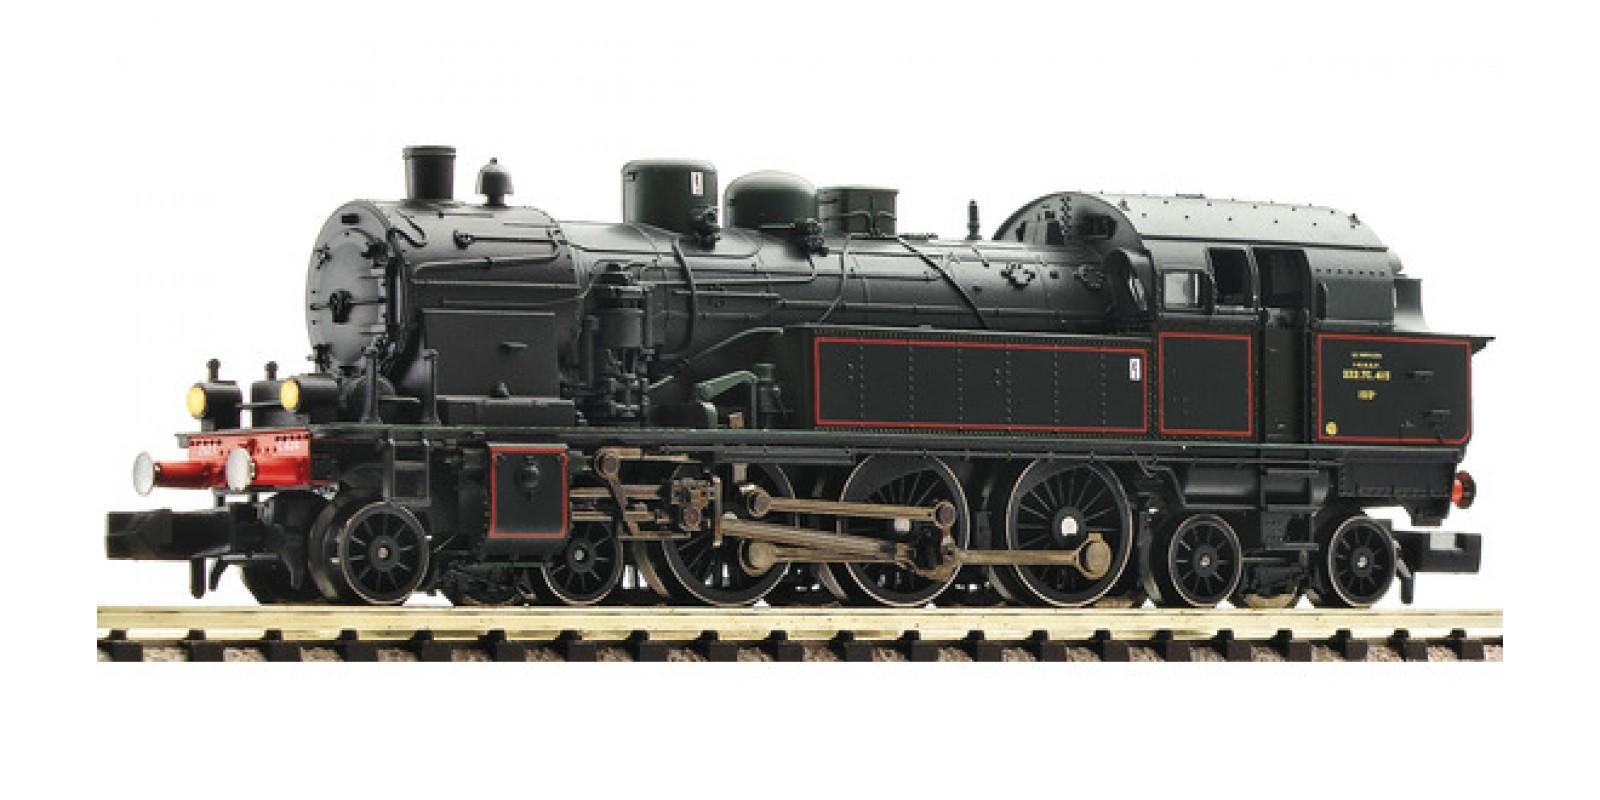 FL707503 - Steam locomotive type 232 TC, SNCF